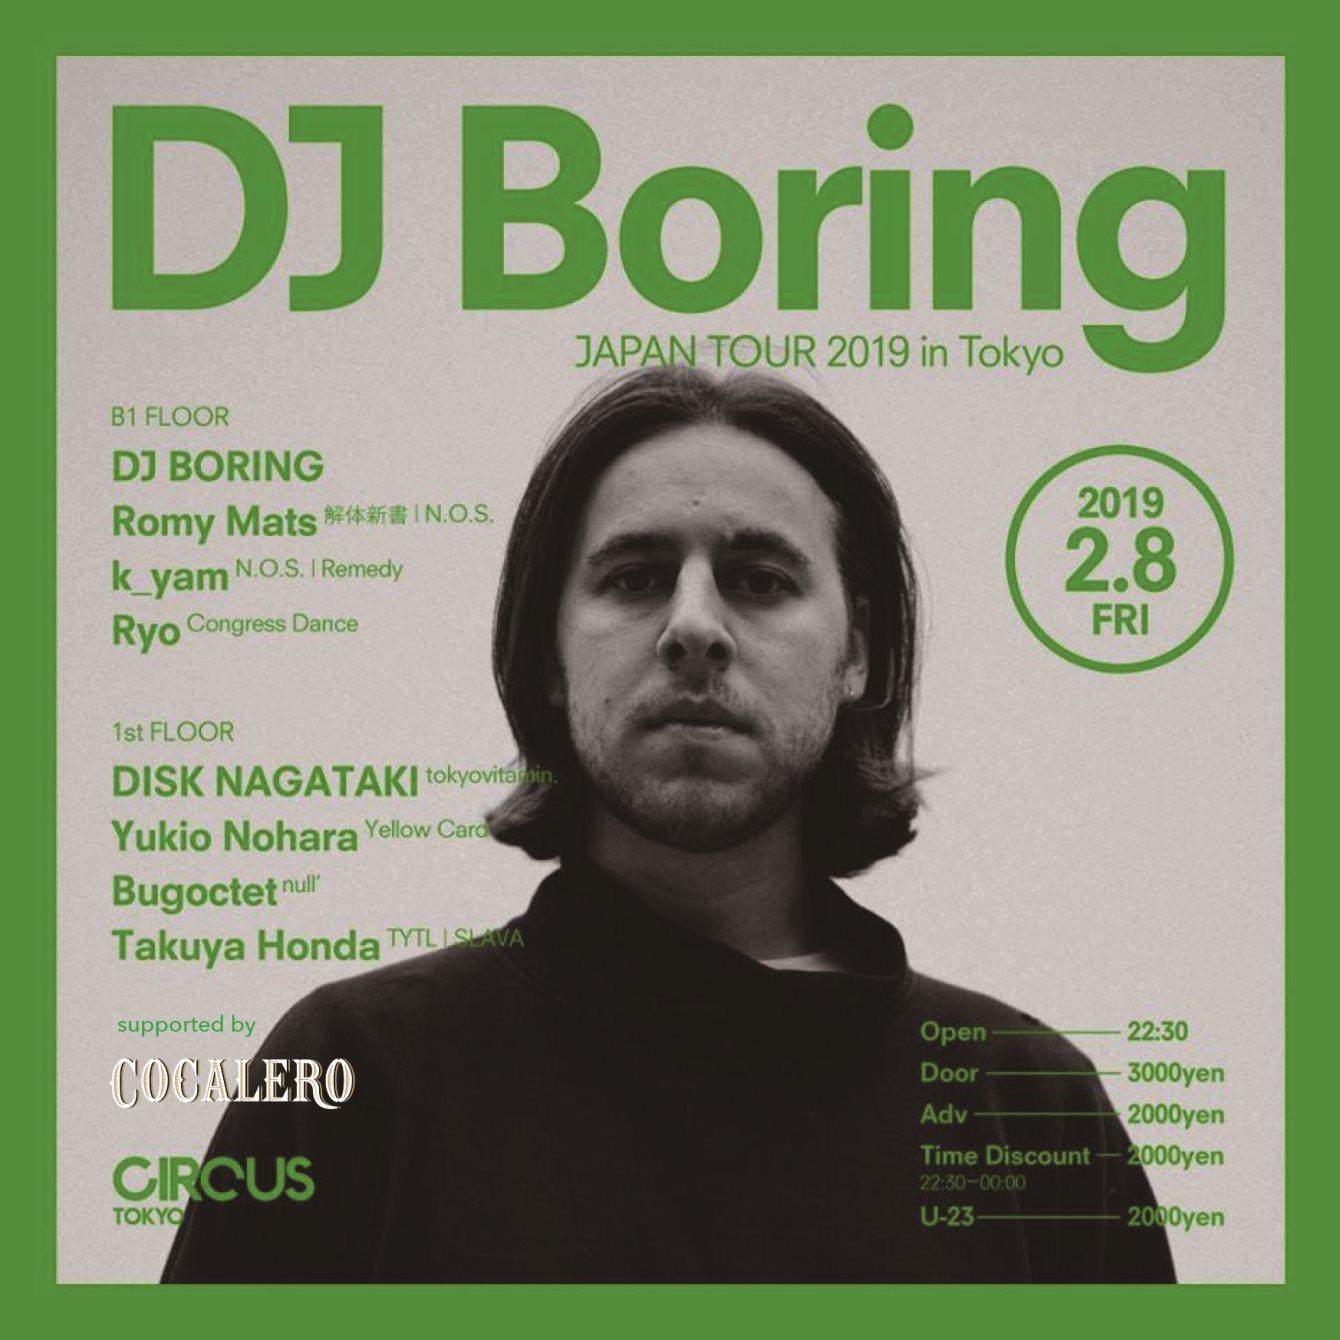 DJ Boring Japan Tour 2019 in Tokyo - Flyer front